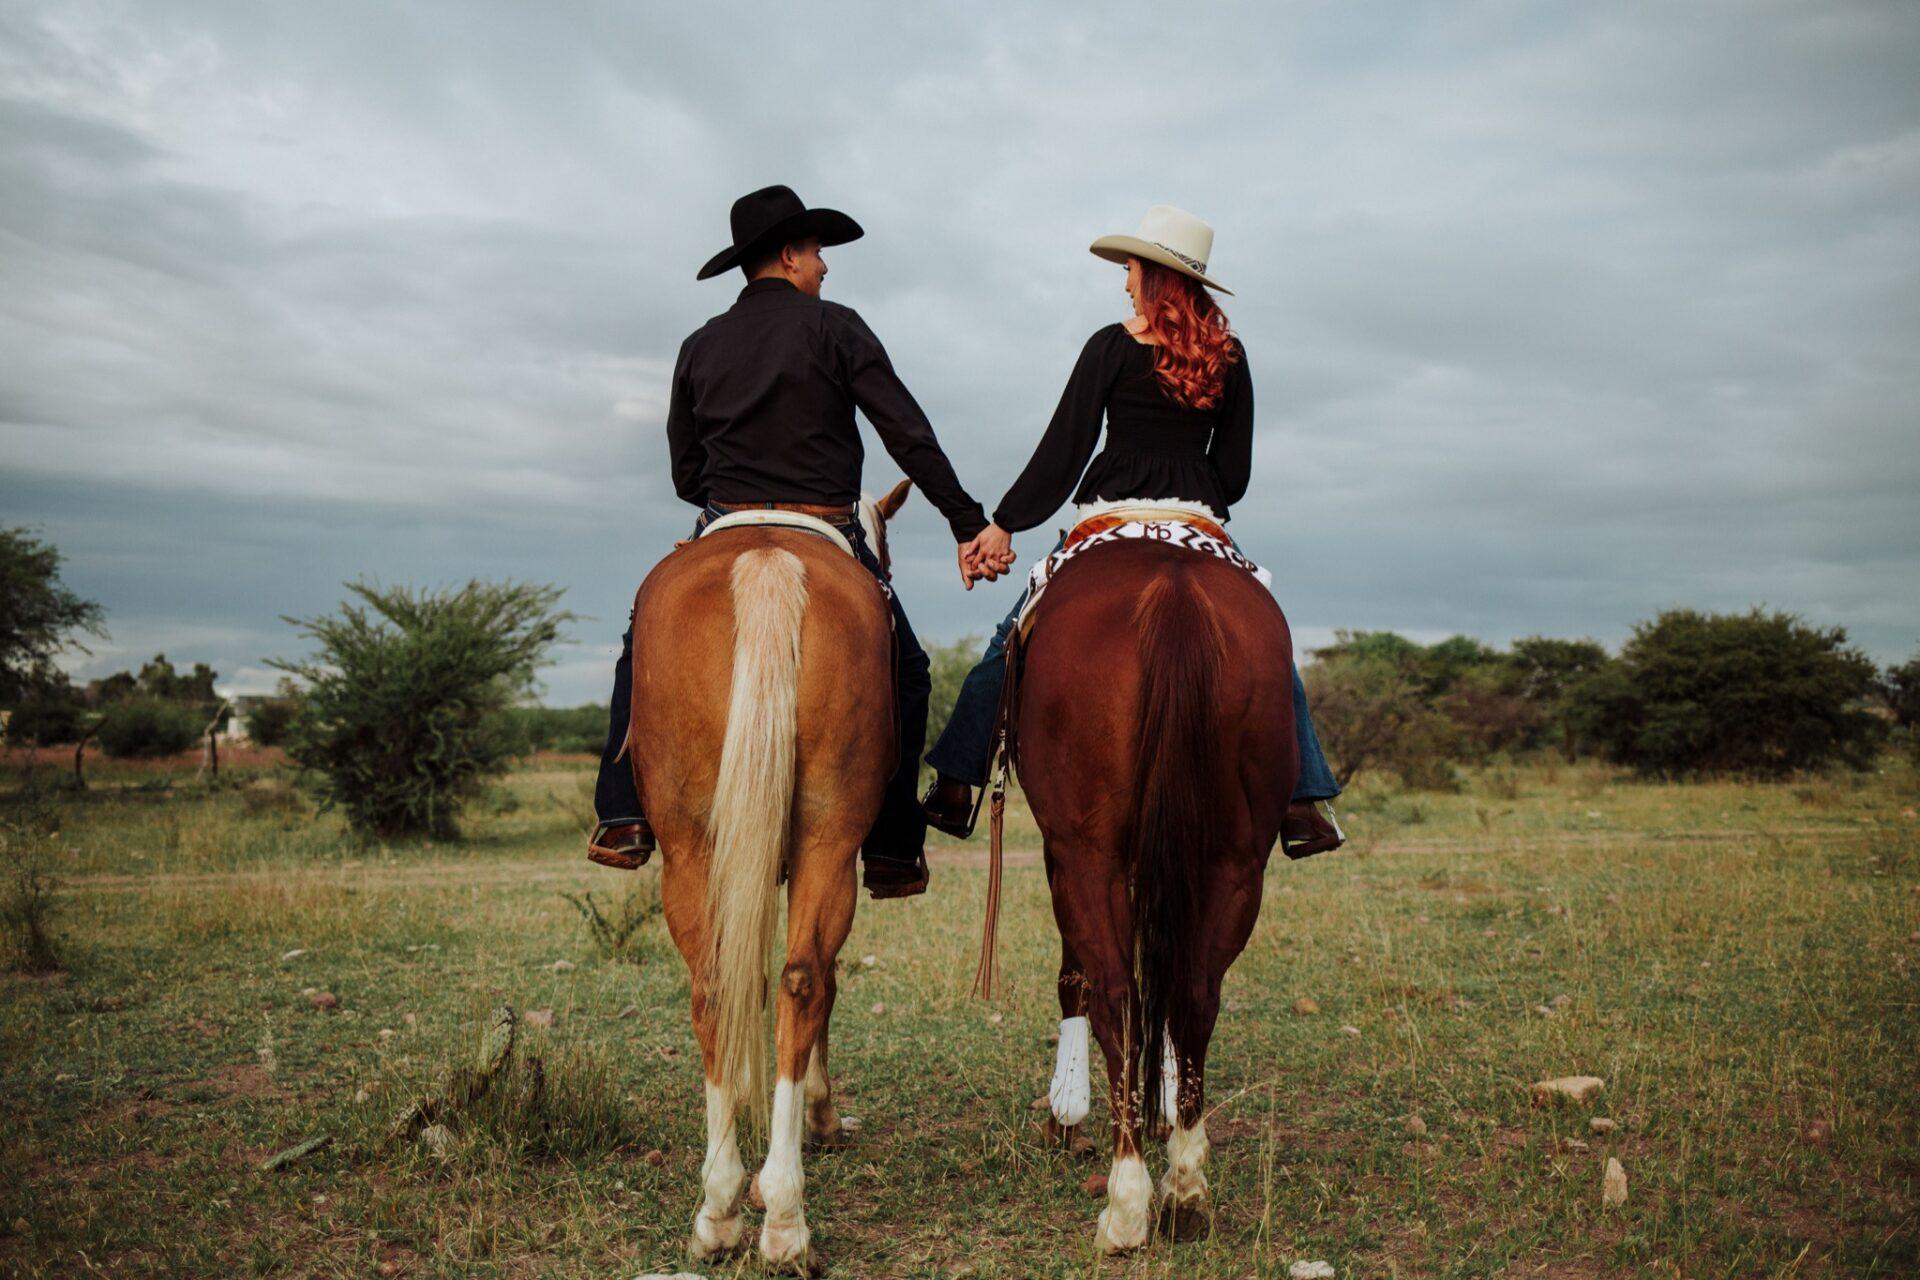 javier_noriega_fotografo_bodas_save_the_date_preboda_jerez_zacatecas_wedding_photographer18